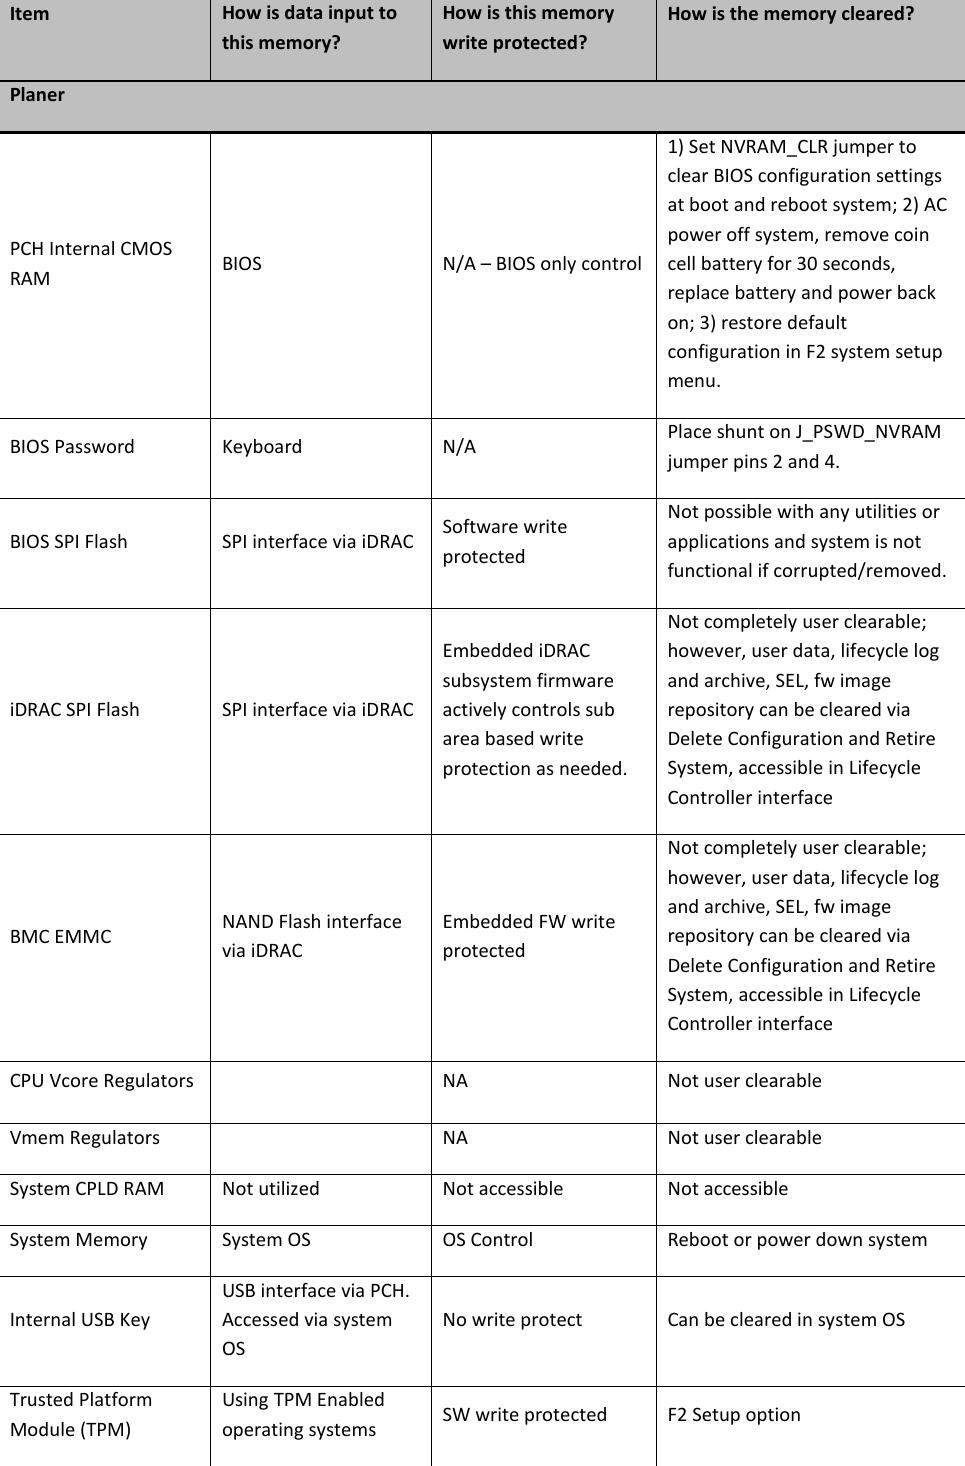 Dell Poweredge R630 Statement Of Volatility –